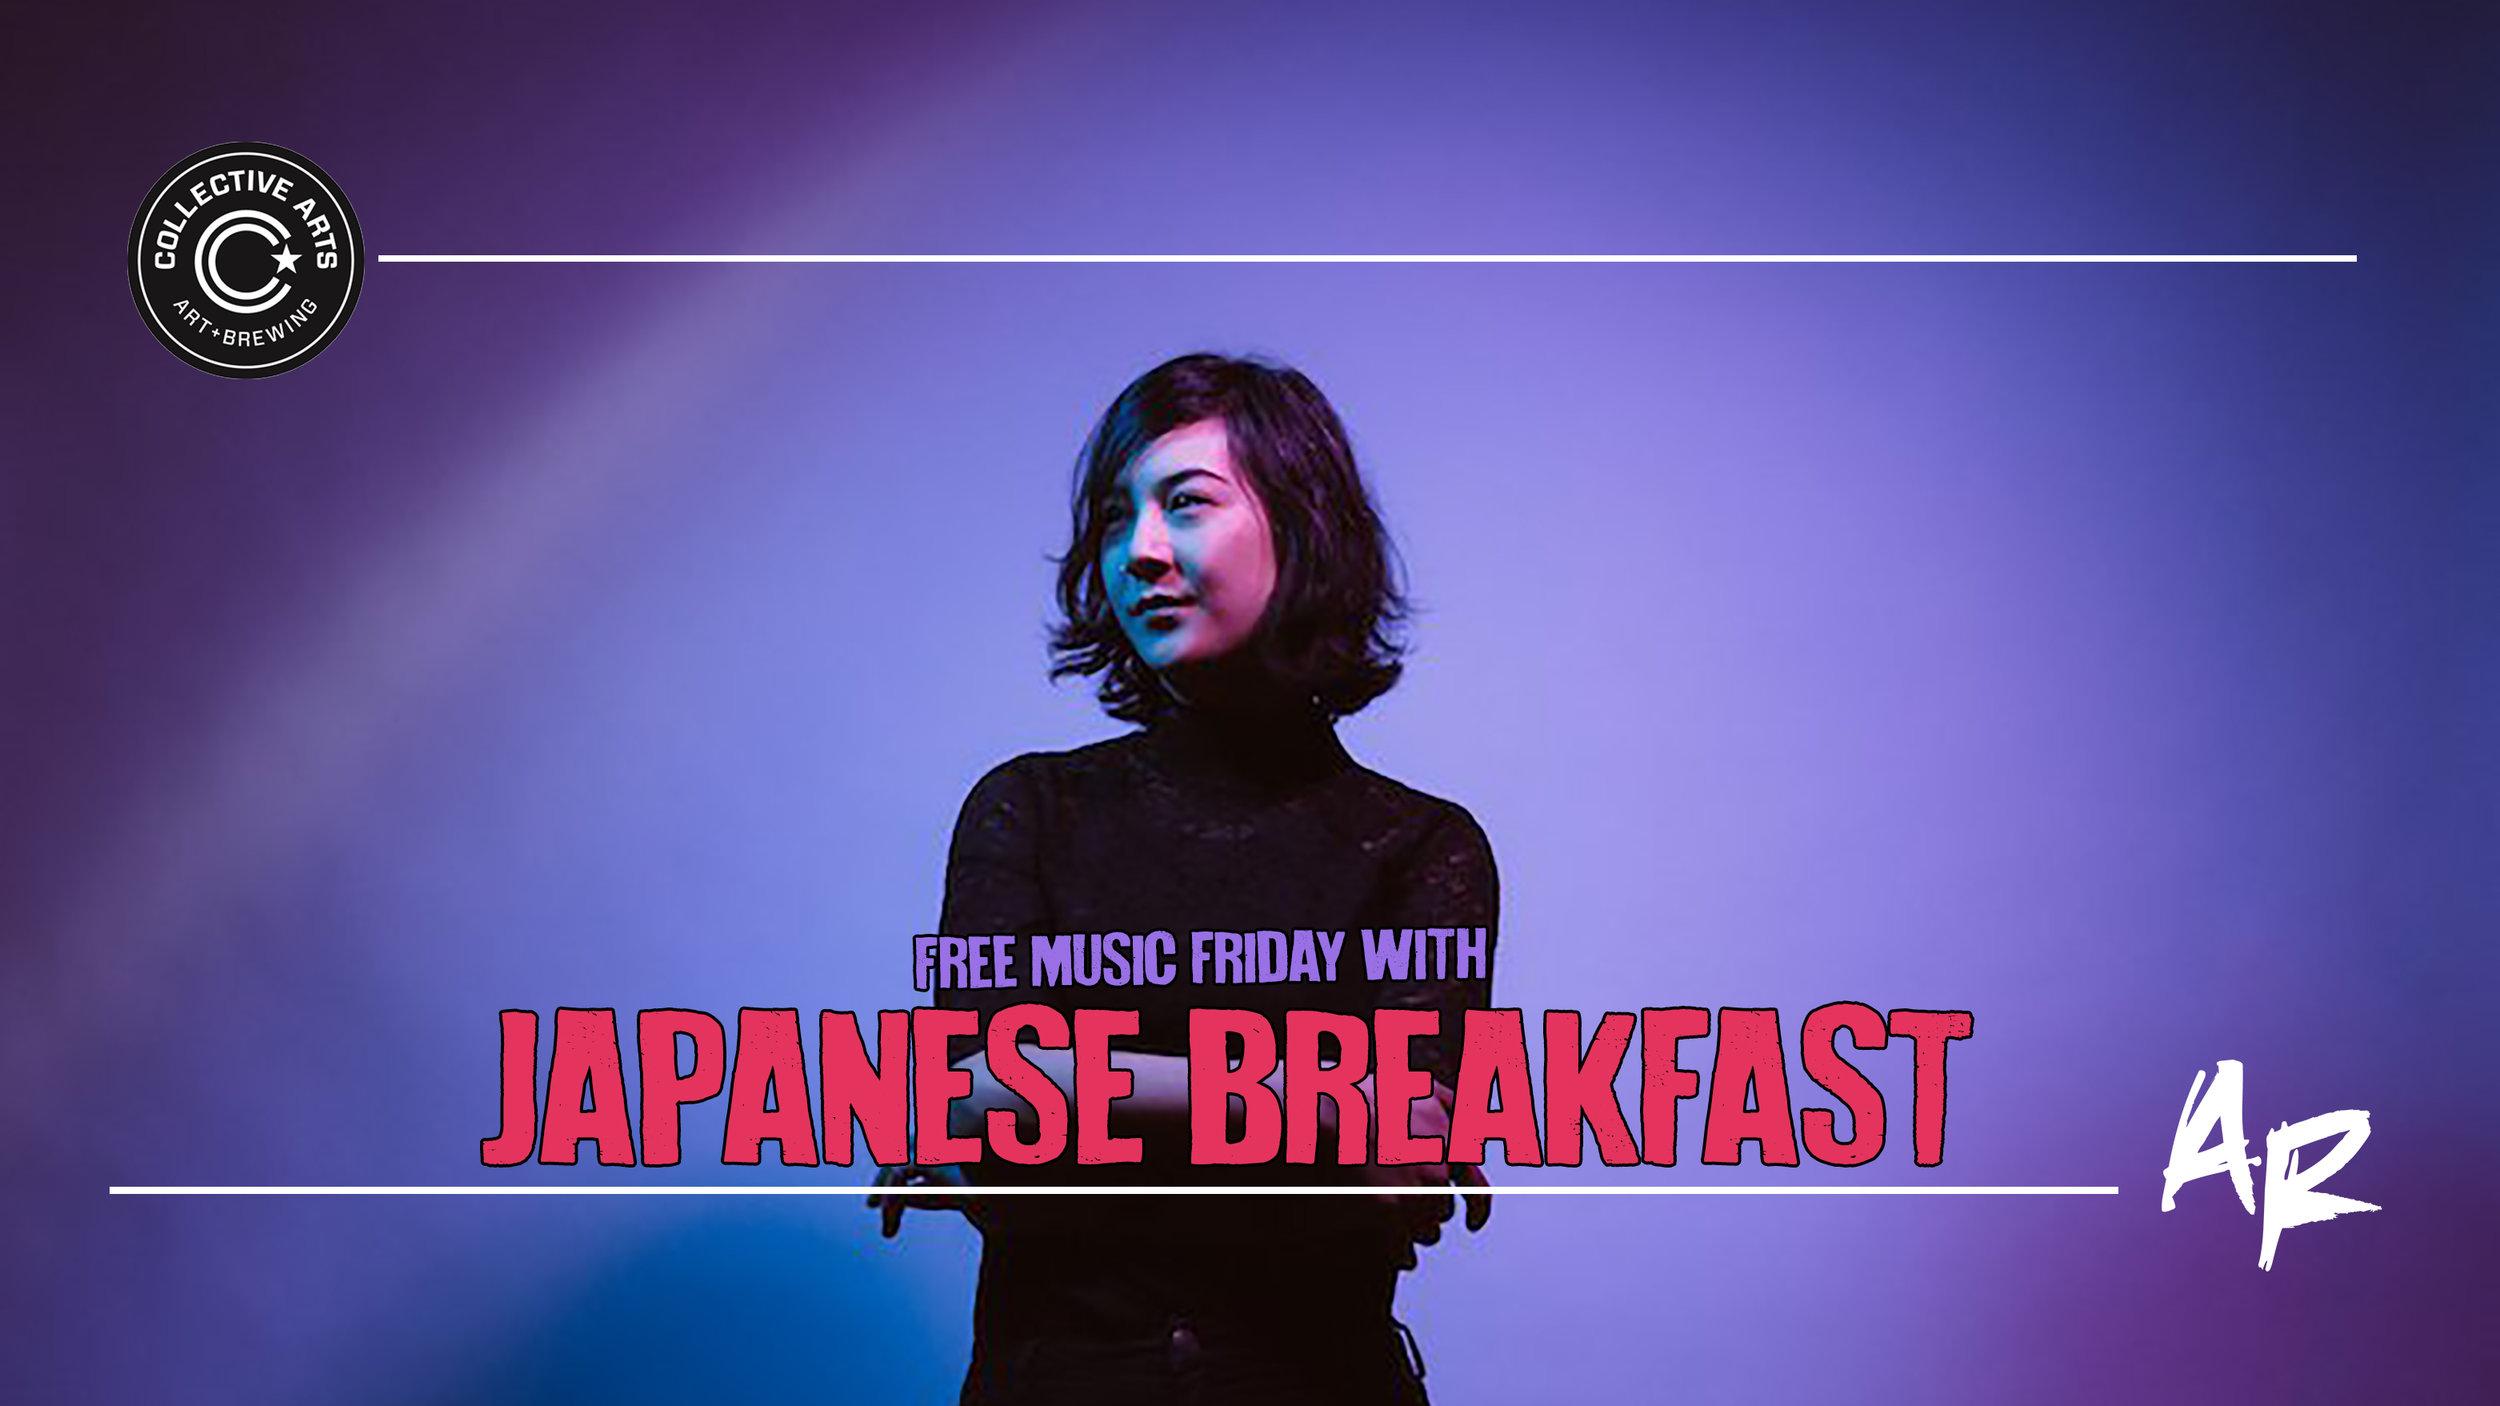 japanesebreakfast_ar